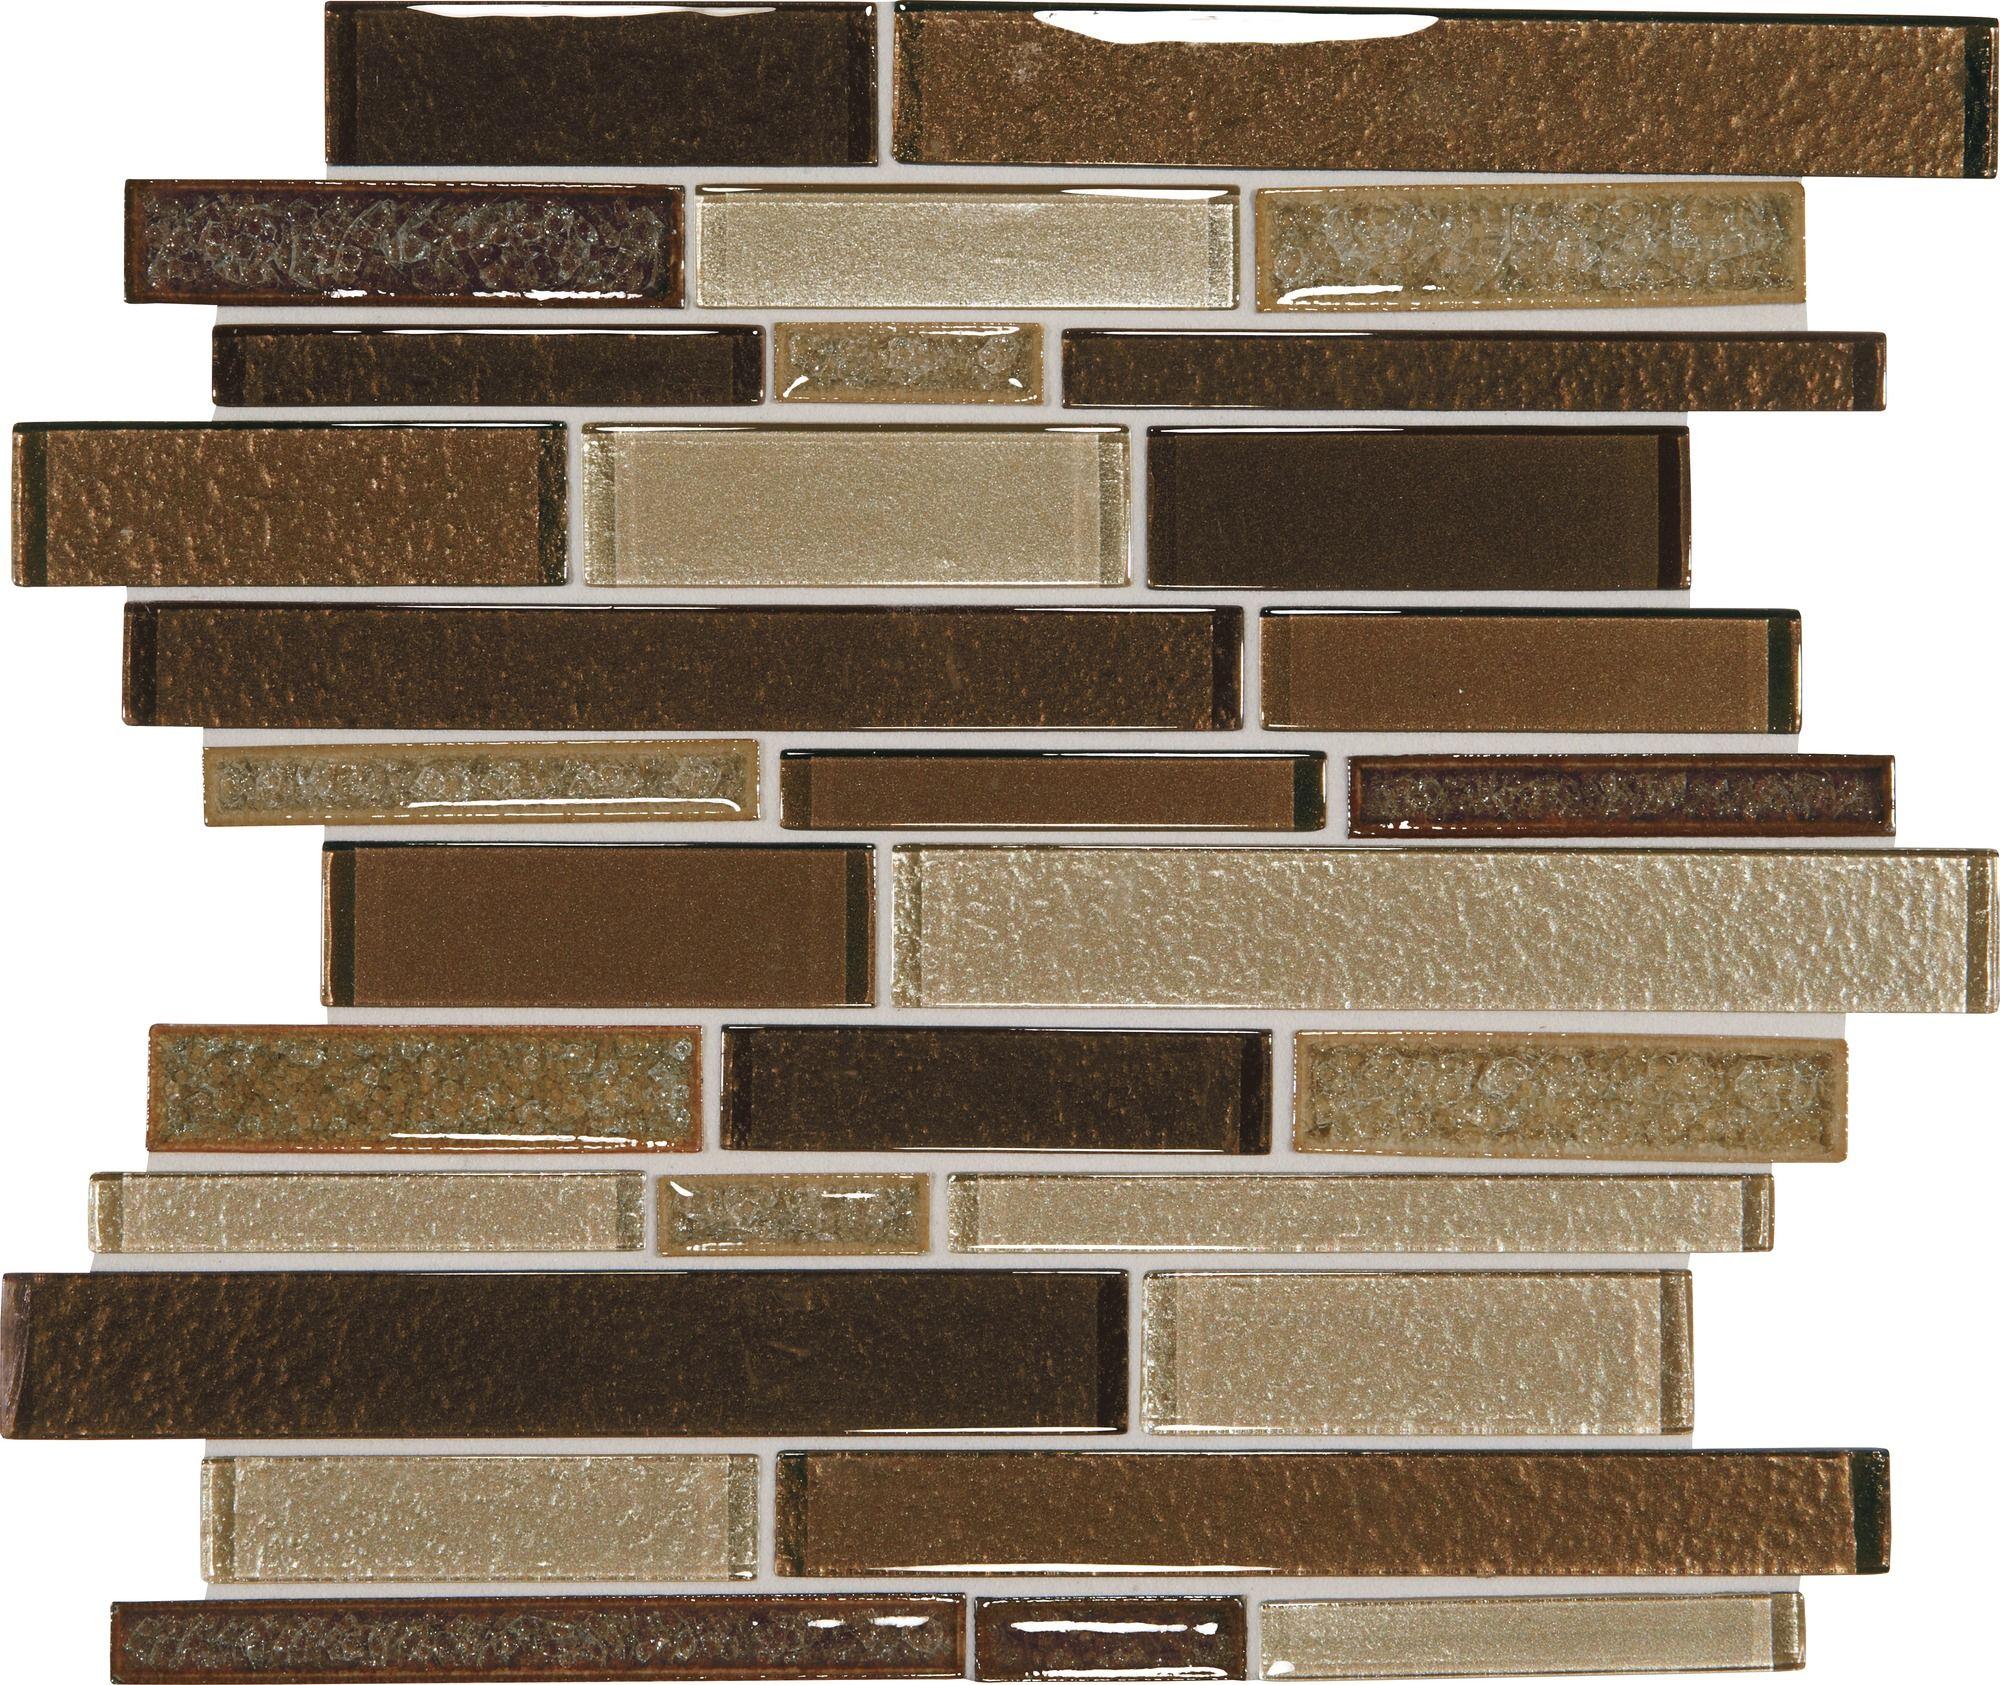 Sample Rustic Copper Linear Natural Slate Blend Mosaic: Crystal Shores Copper Coast 12x13 Random Linear Blended